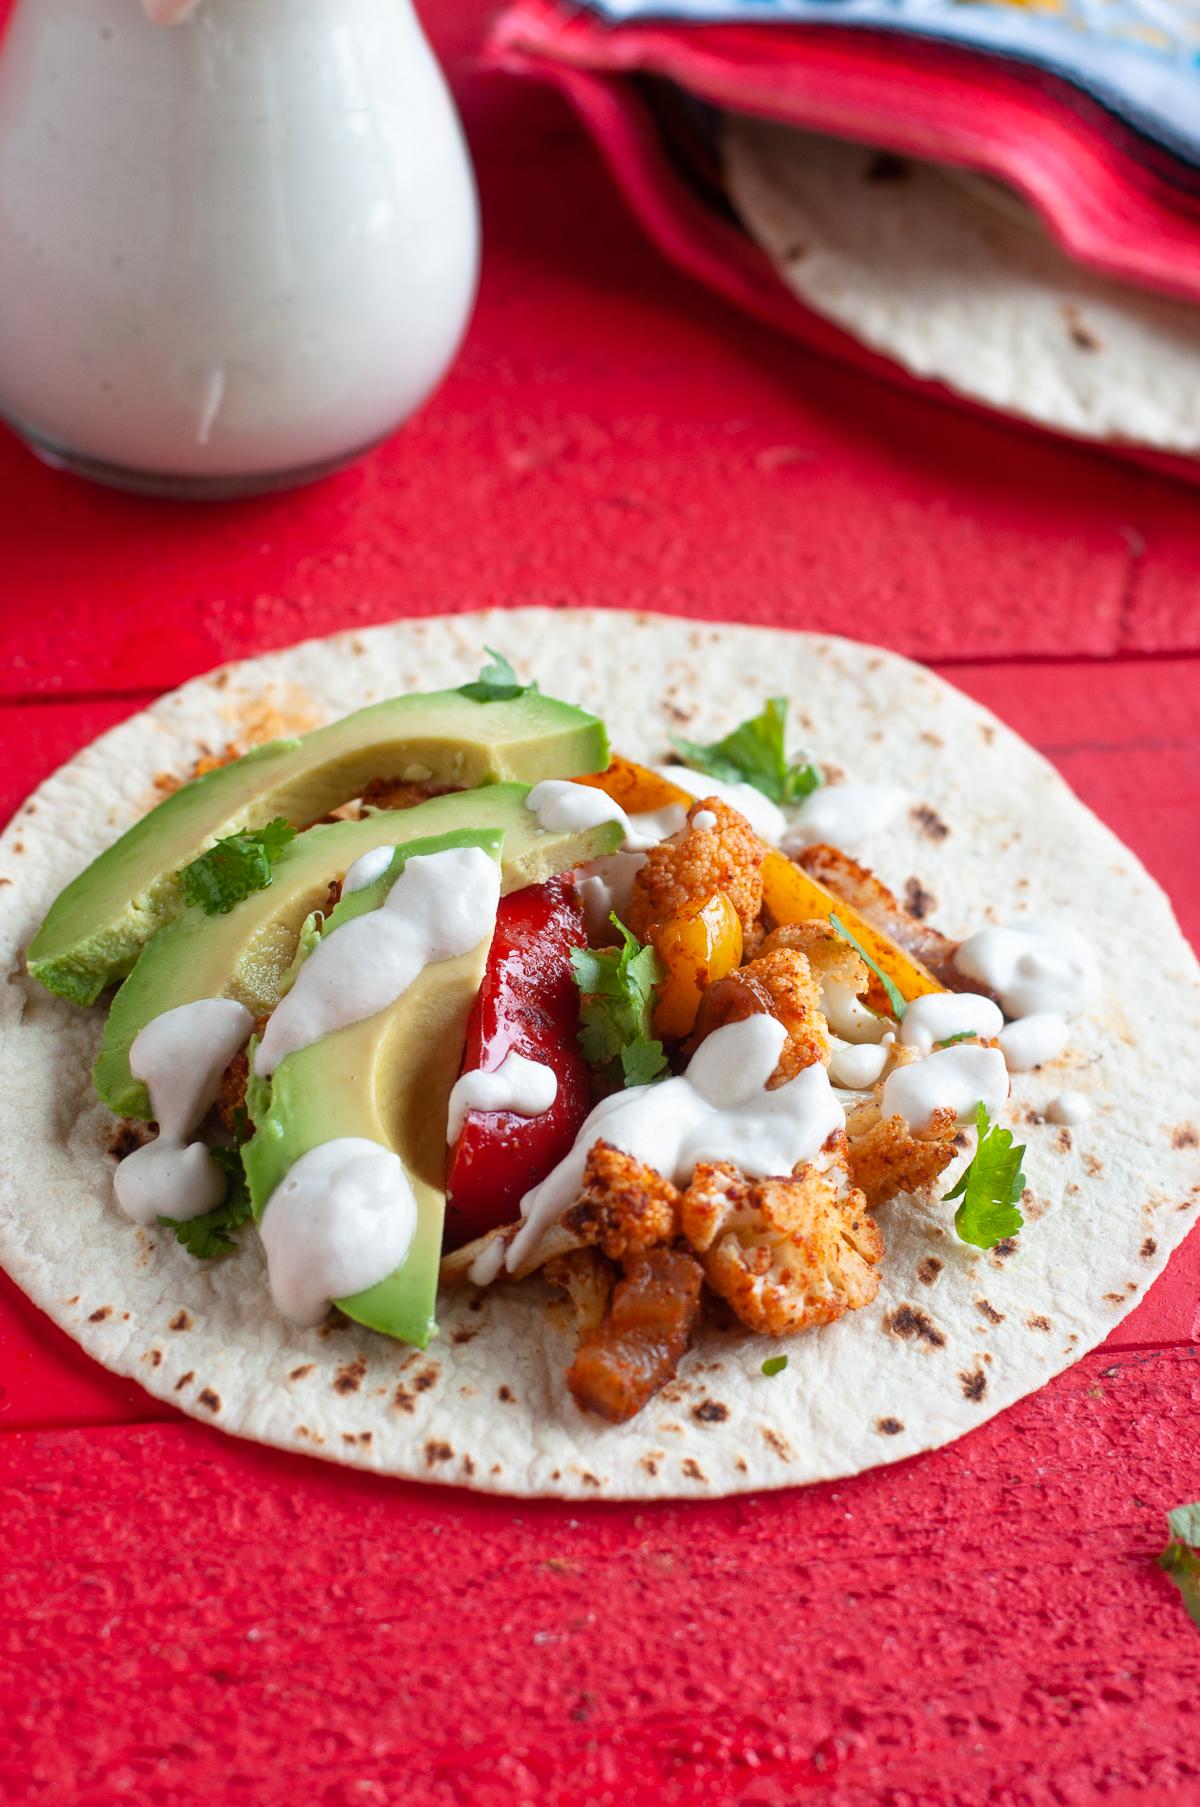 Looking for a quick and easy dinner recipe? You're going to love how easy it is to make these Vegan Sheet Pan Cauliflower Fajitas! #vegan #fajitas #vegetarian #dinner #sheetpan #easyrecipes